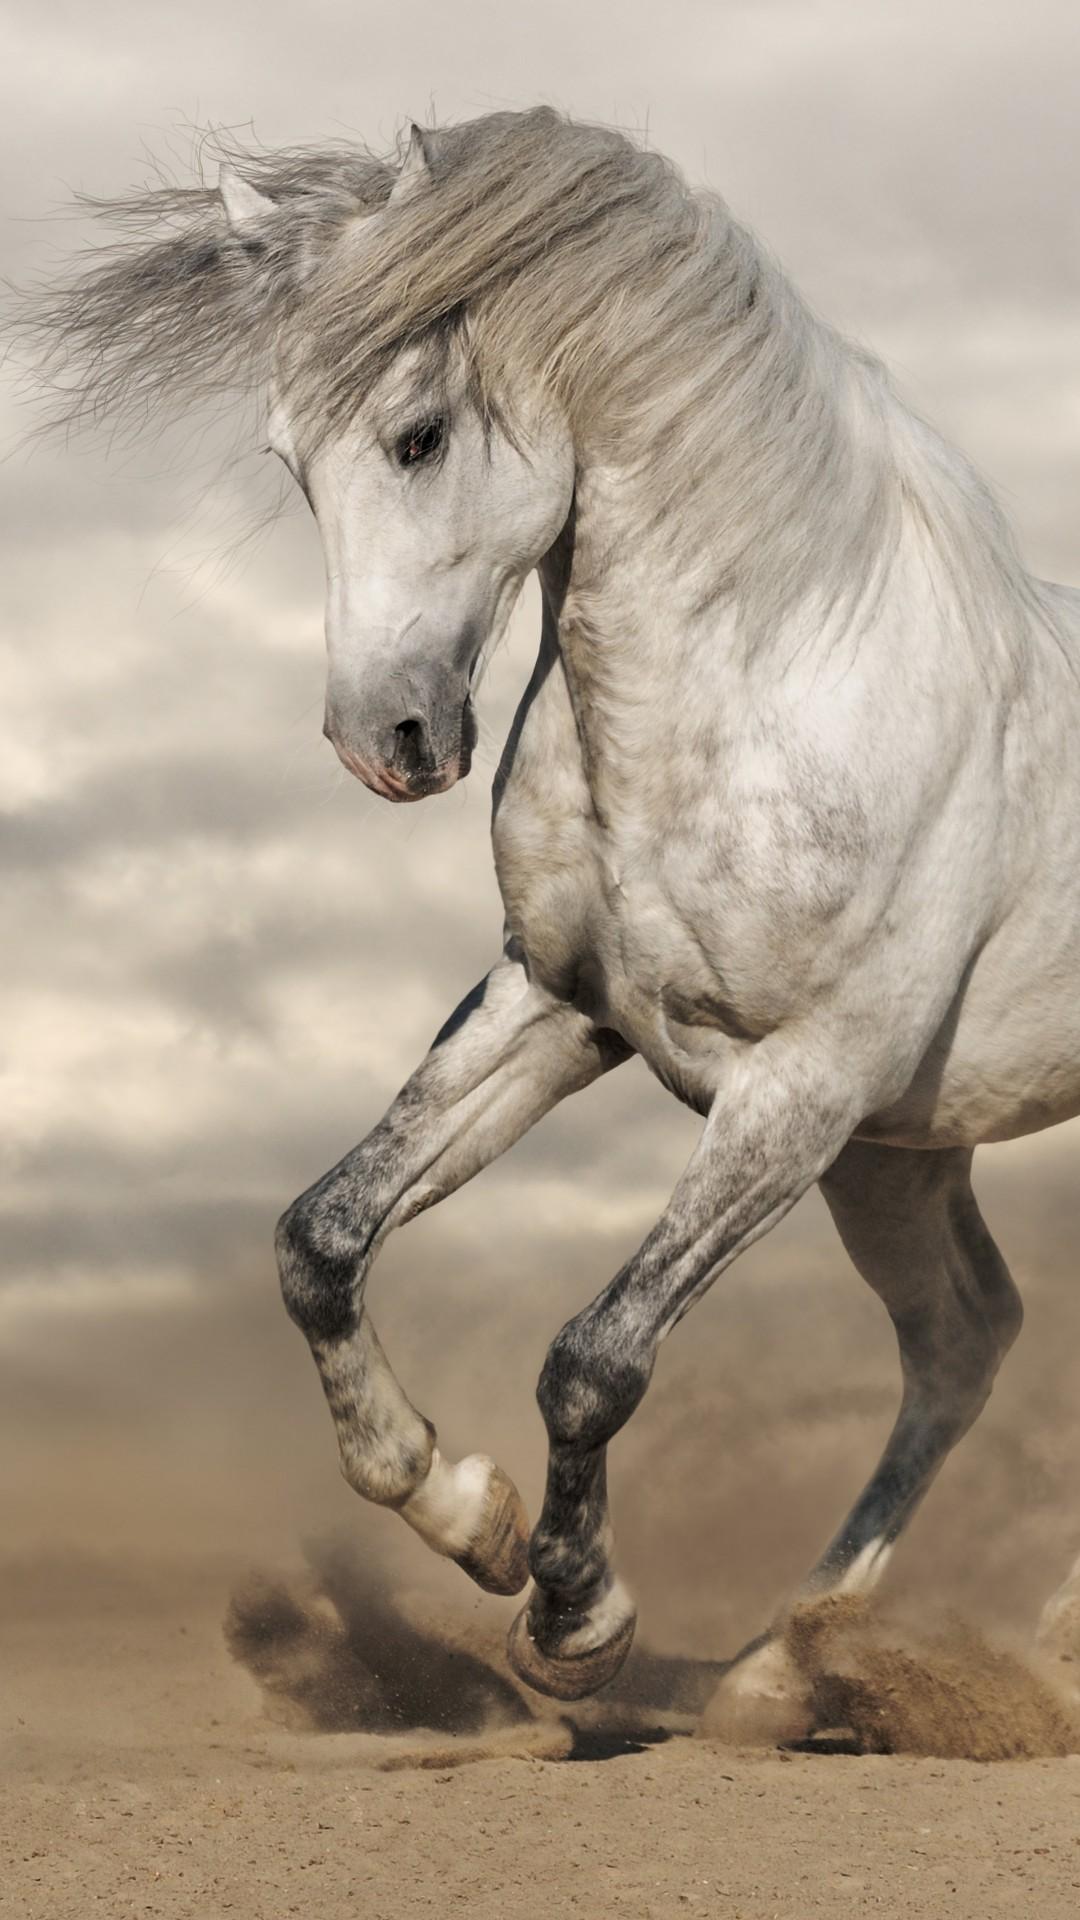 horse 8k animals wallpapers